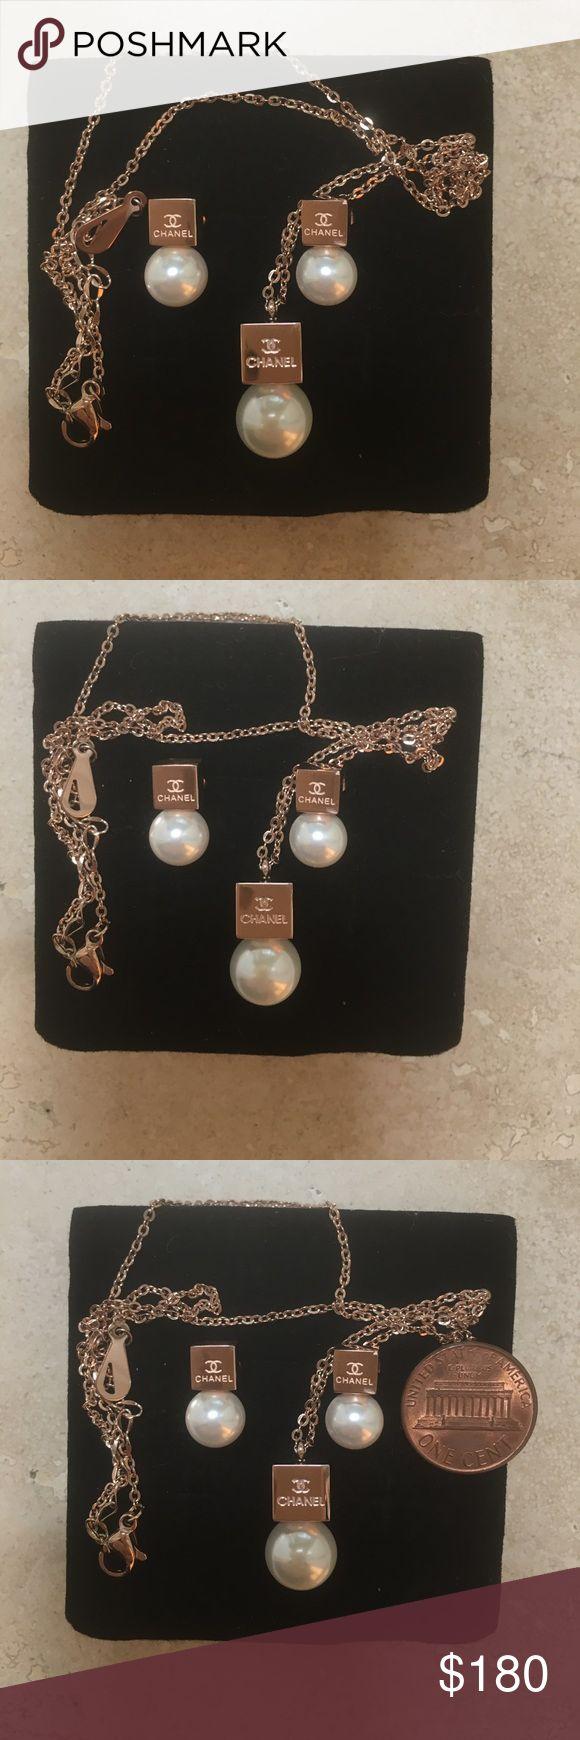 Chanel Pearls Earrings Necklace